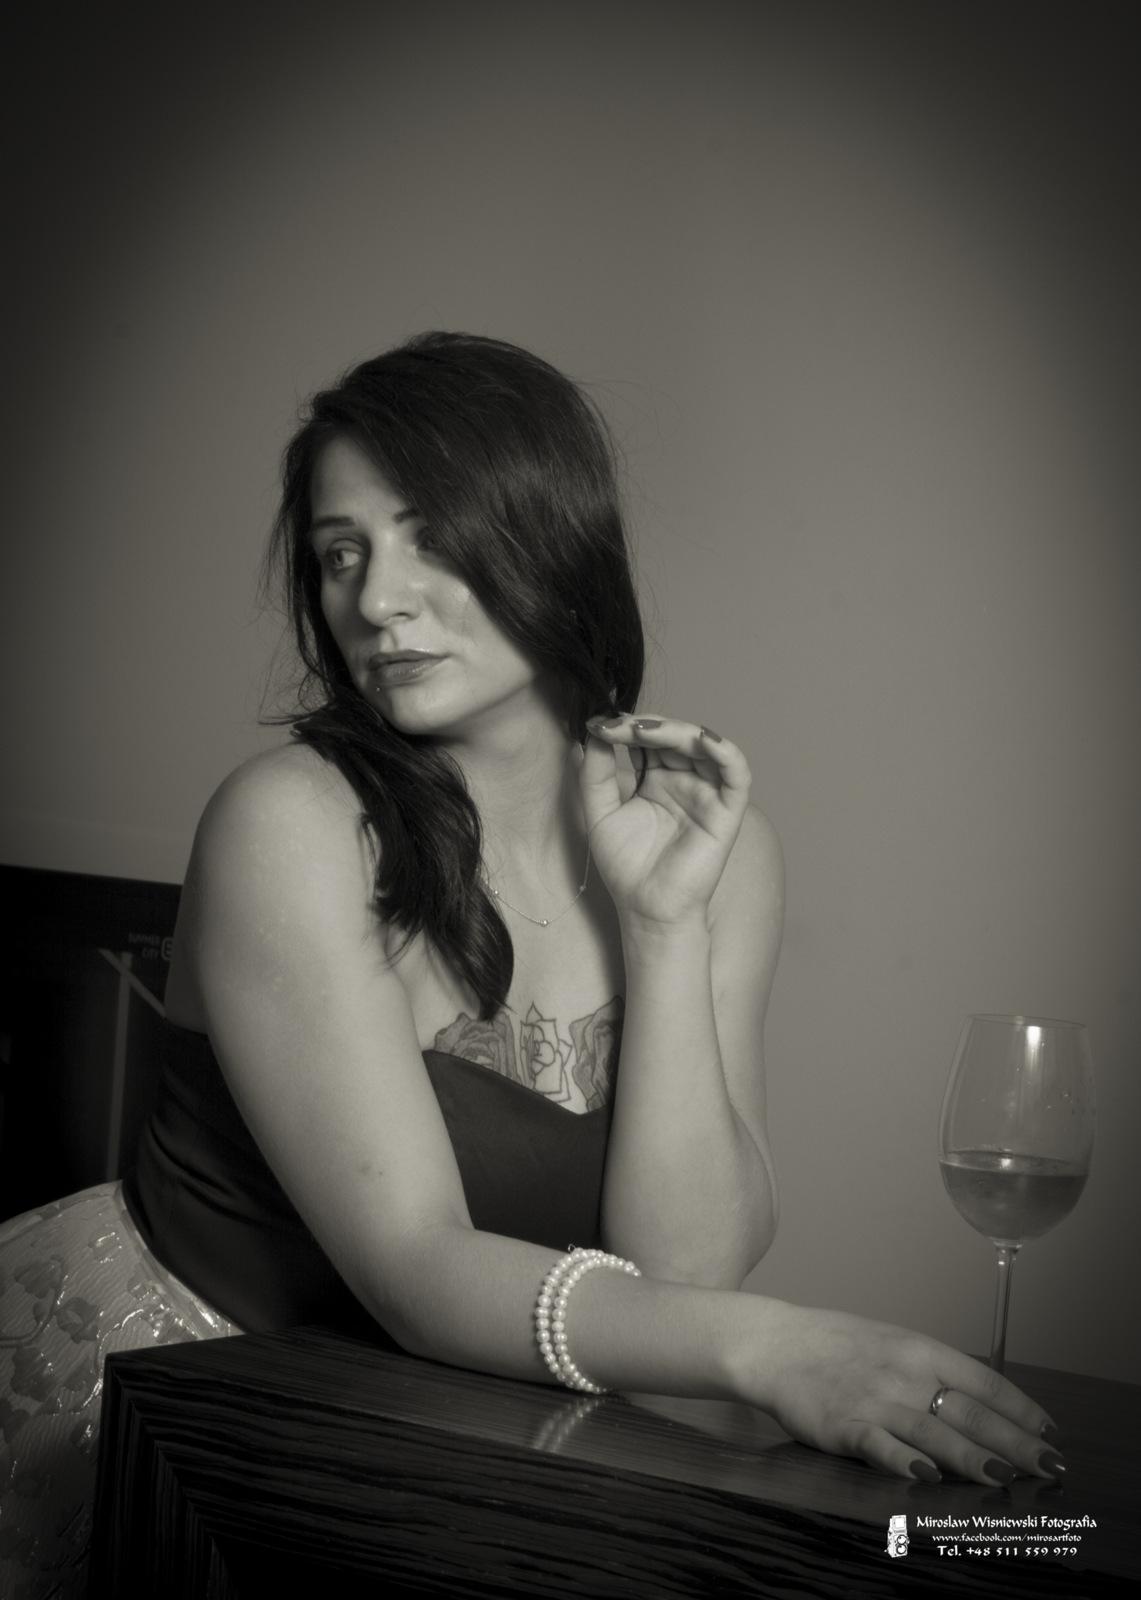 sesja plener studio, Miroslaw Wisniewski Fotografia